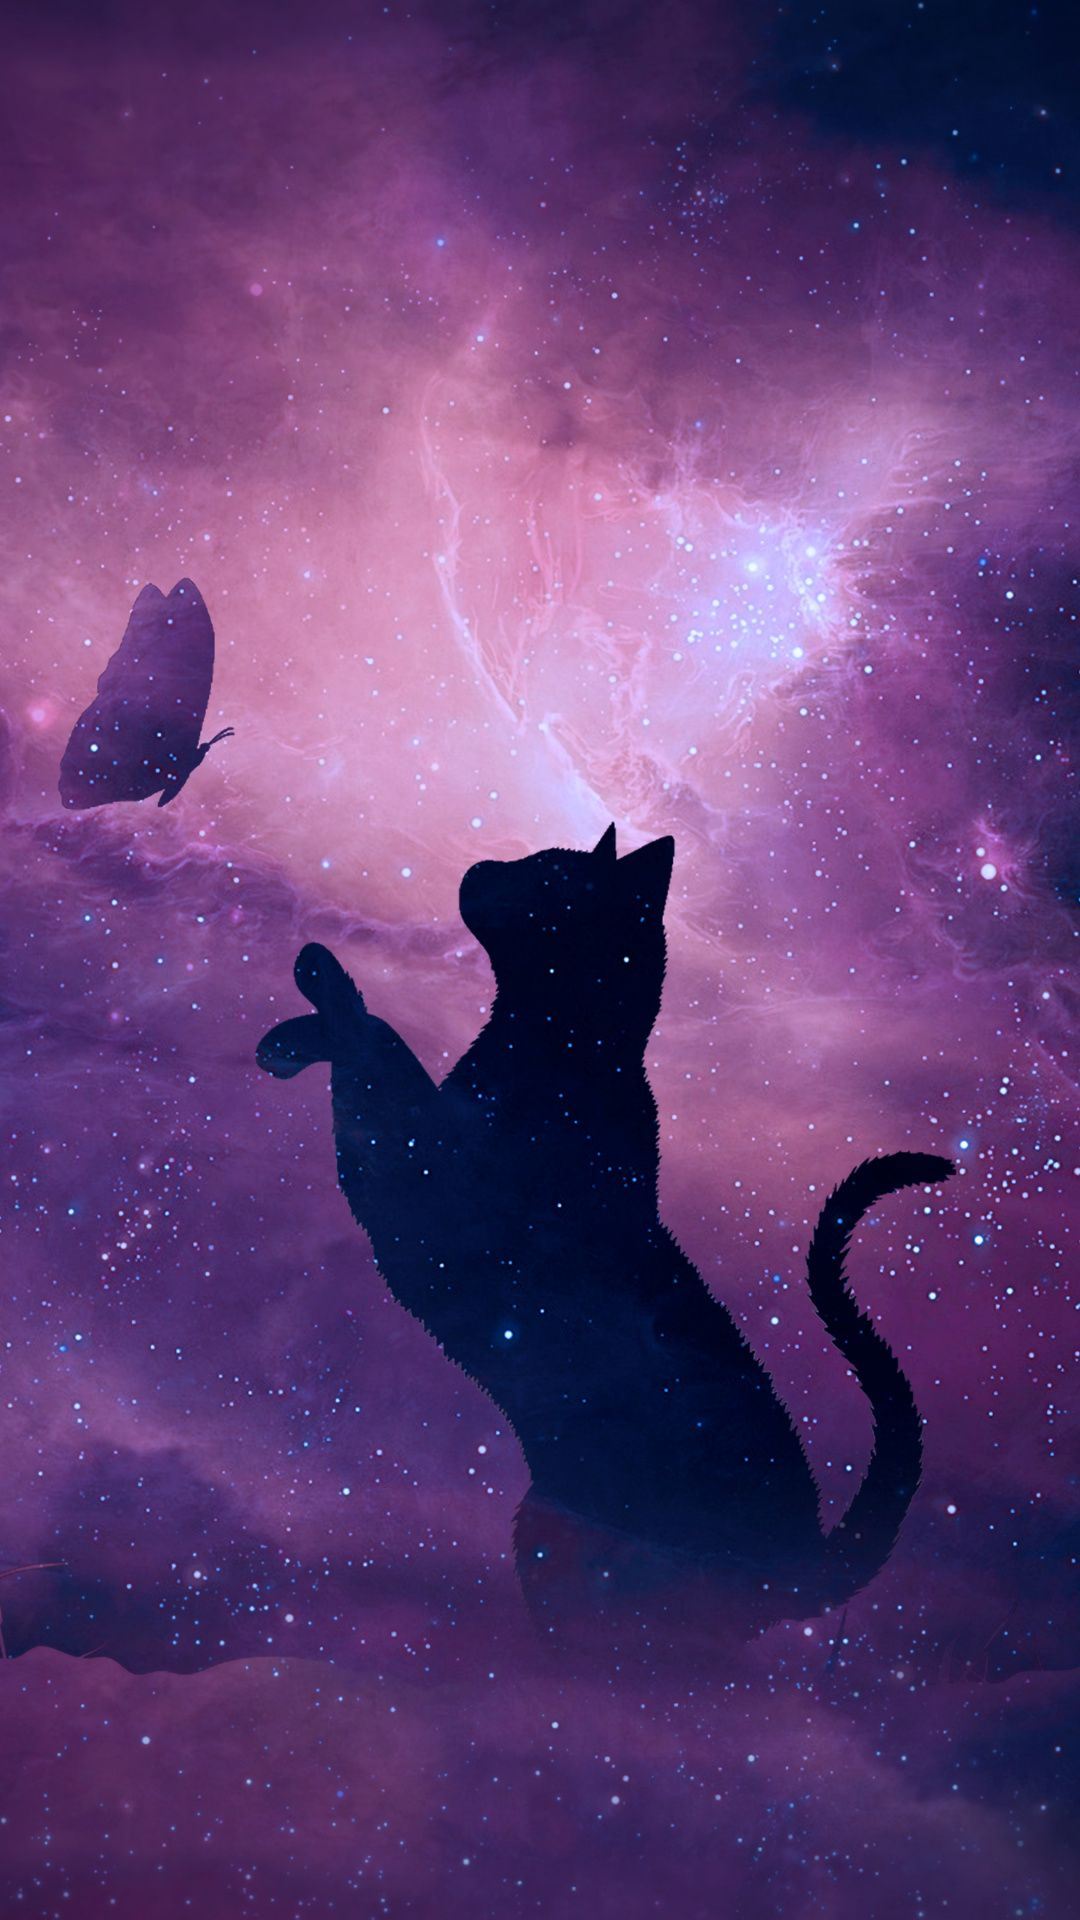 Wallpapers Black Cat Silhouette Cat Art Violet Black Cat Anime Cute Cat Wallpaper Cat Art